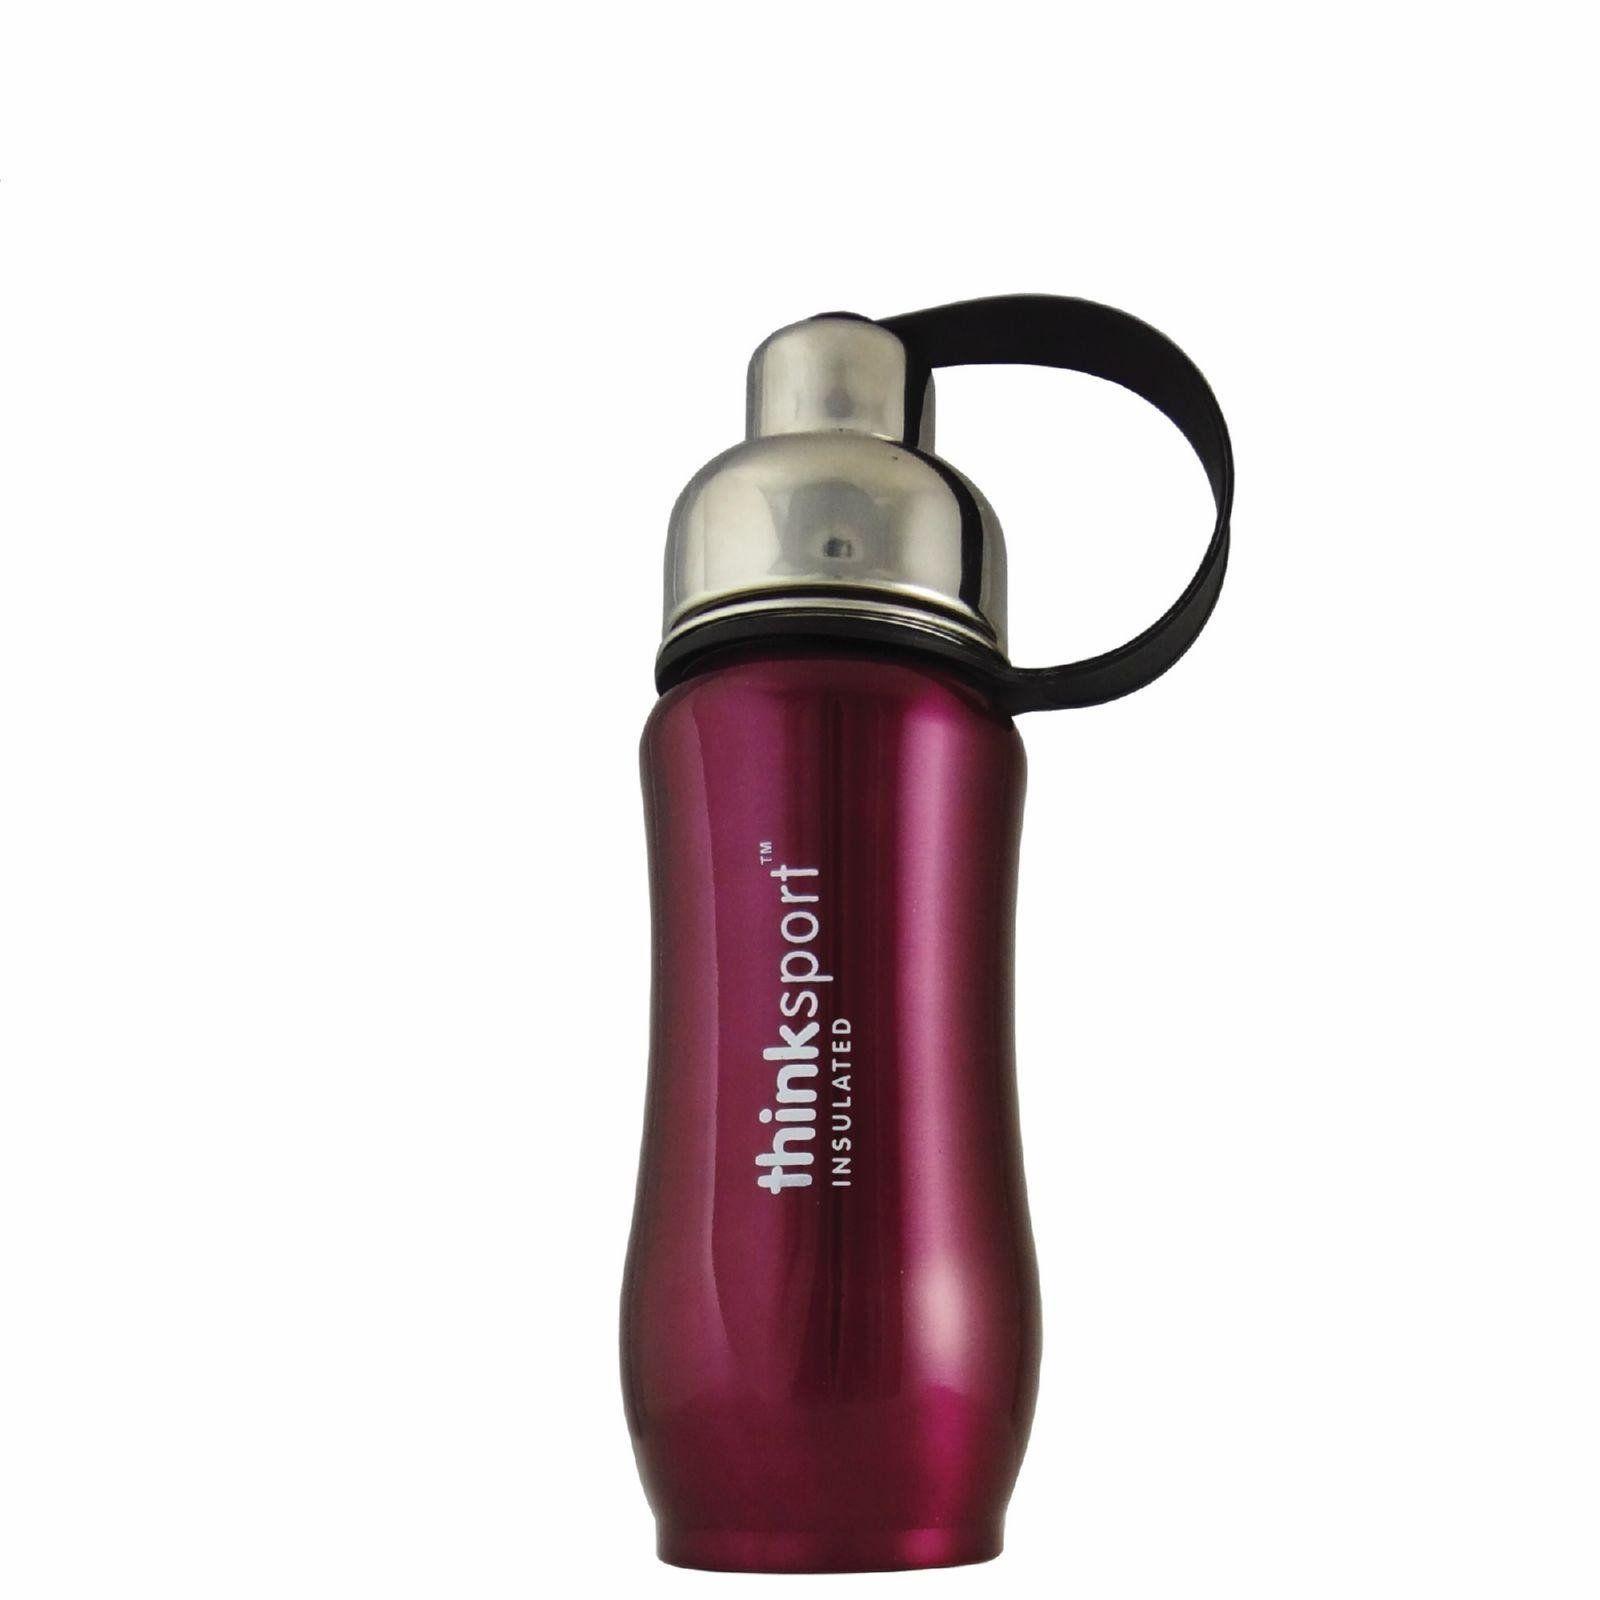 Thinksport Insulated Sport Bottle Purple 12 Oz